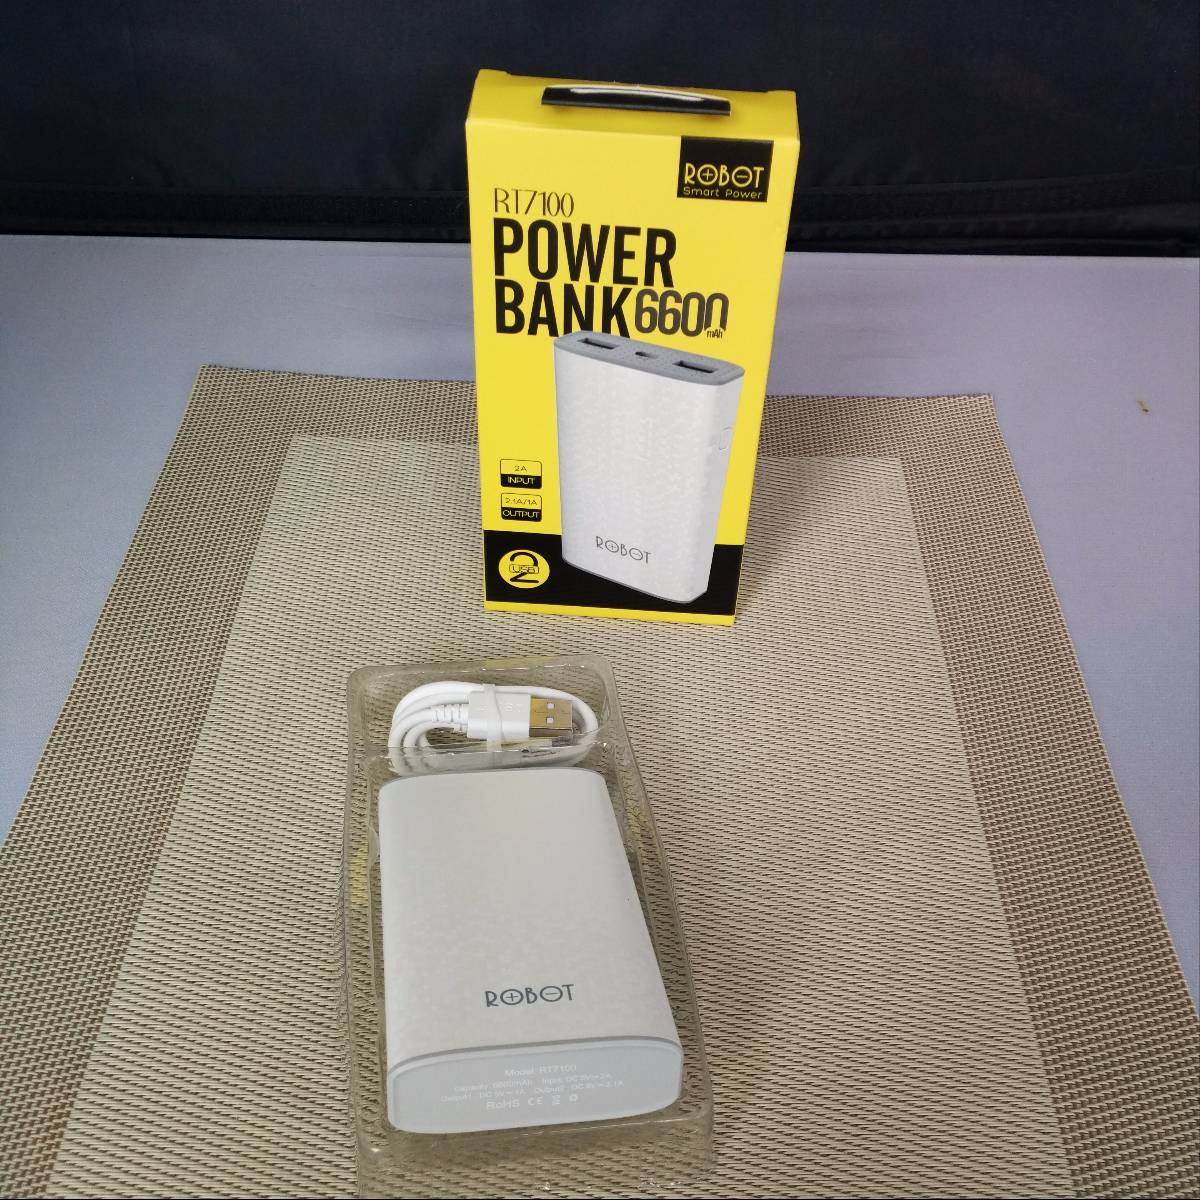 Powerbank Robot 6600mah Dual Usb